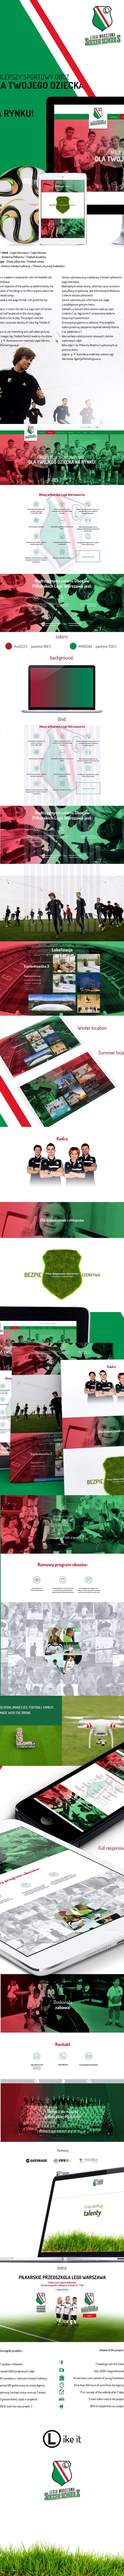 Legia Warsaw Football Camps/ Obozy Piłkarskie Legii on Behance